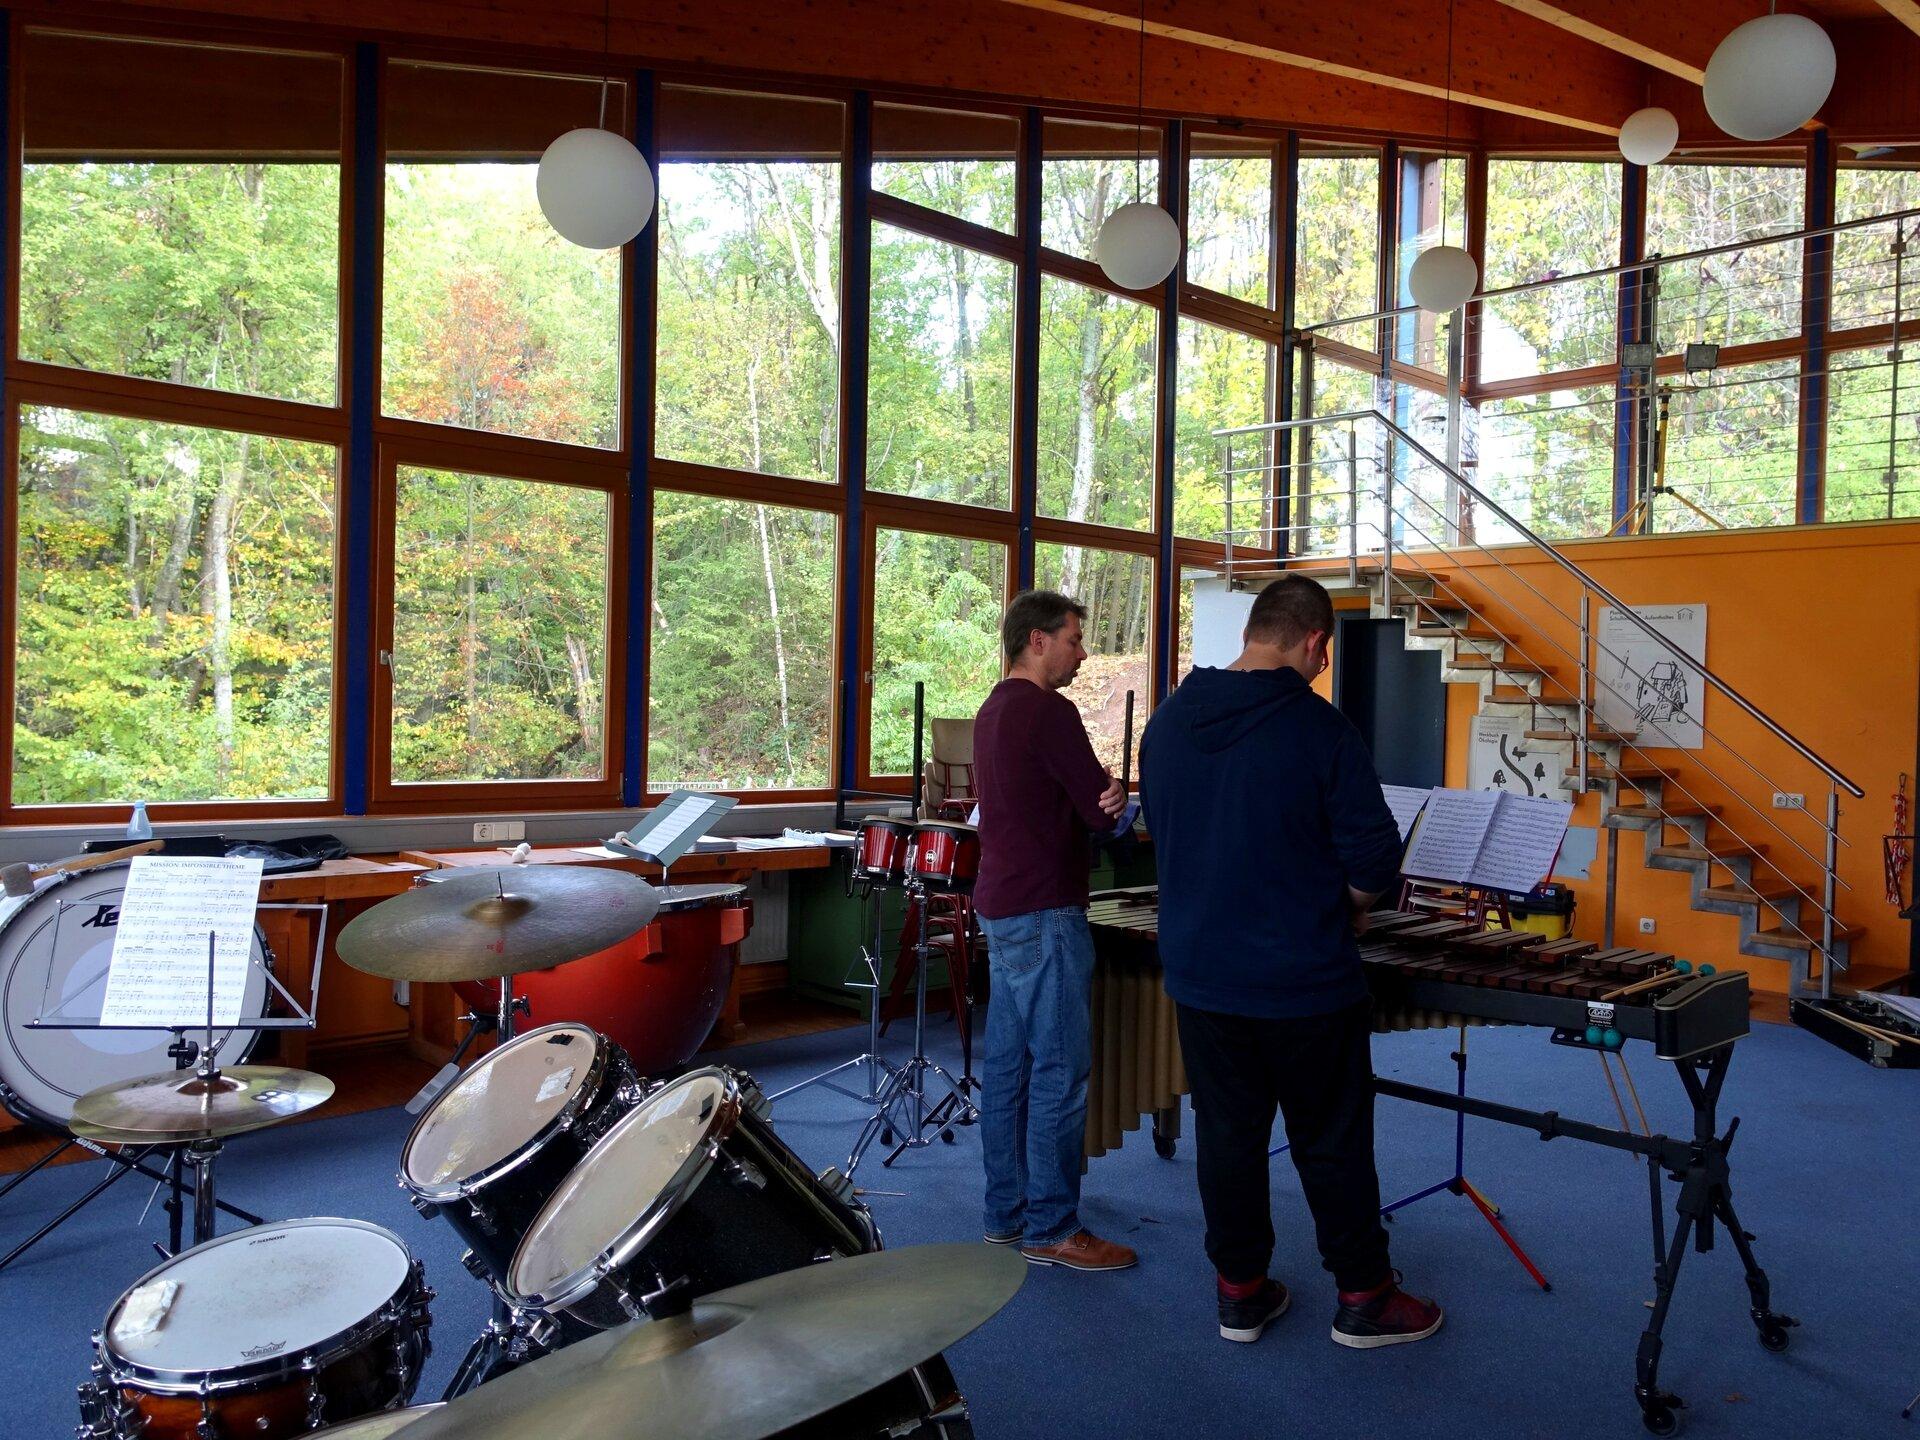 Musikausstattung im Pavillon